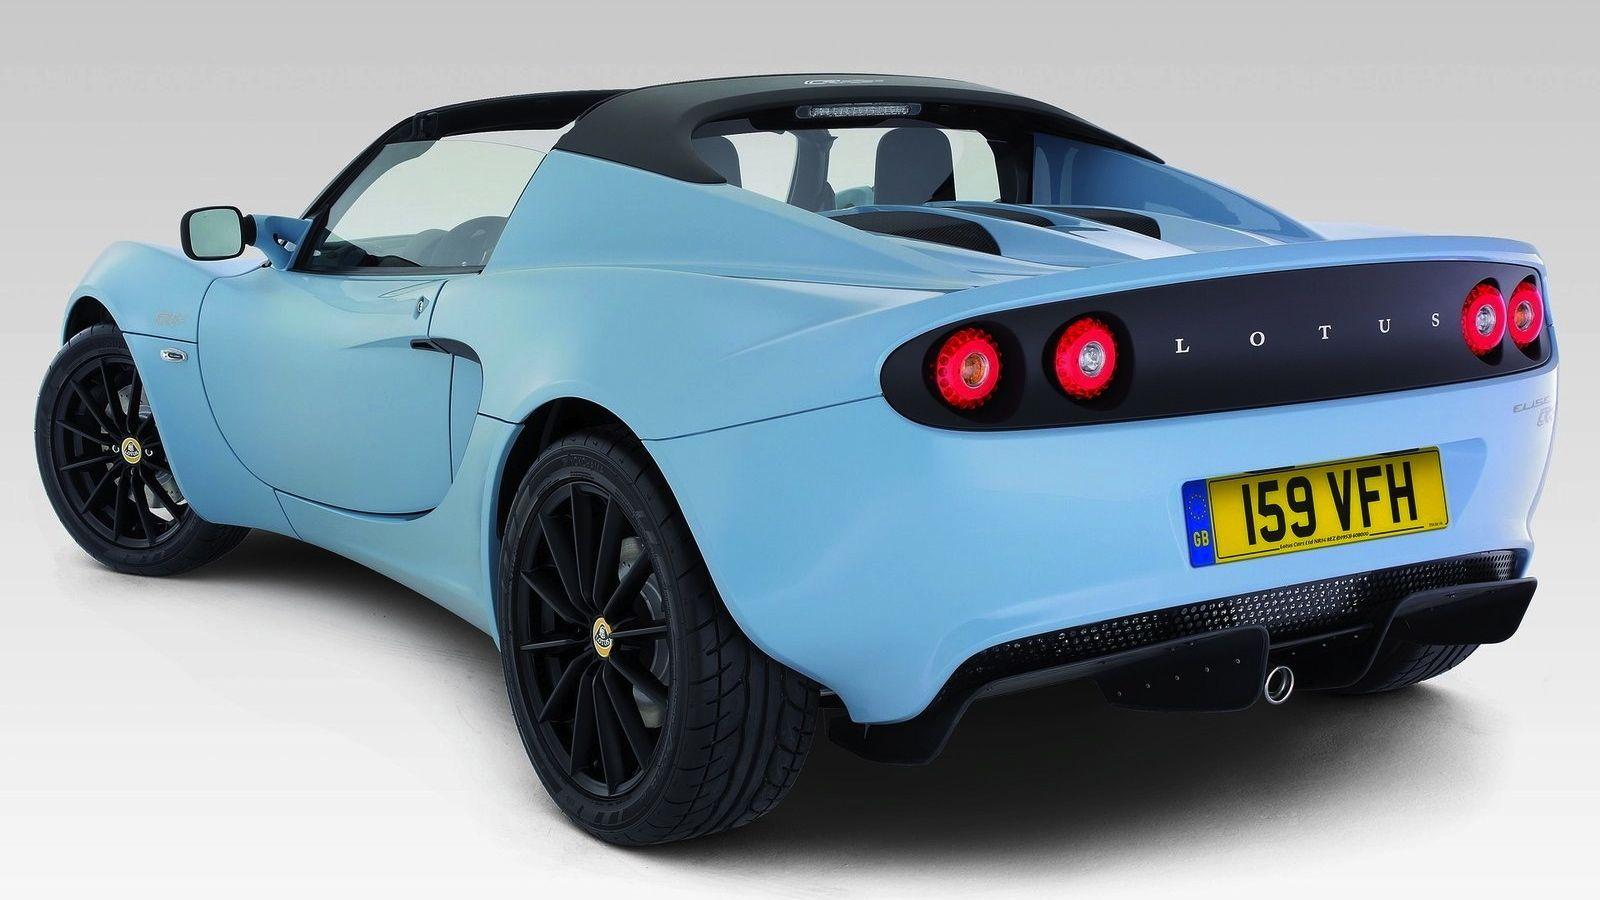 Baby Blue Lotus With Images Lotus Elise Elise Car Lotus Images, Photos, Reviews